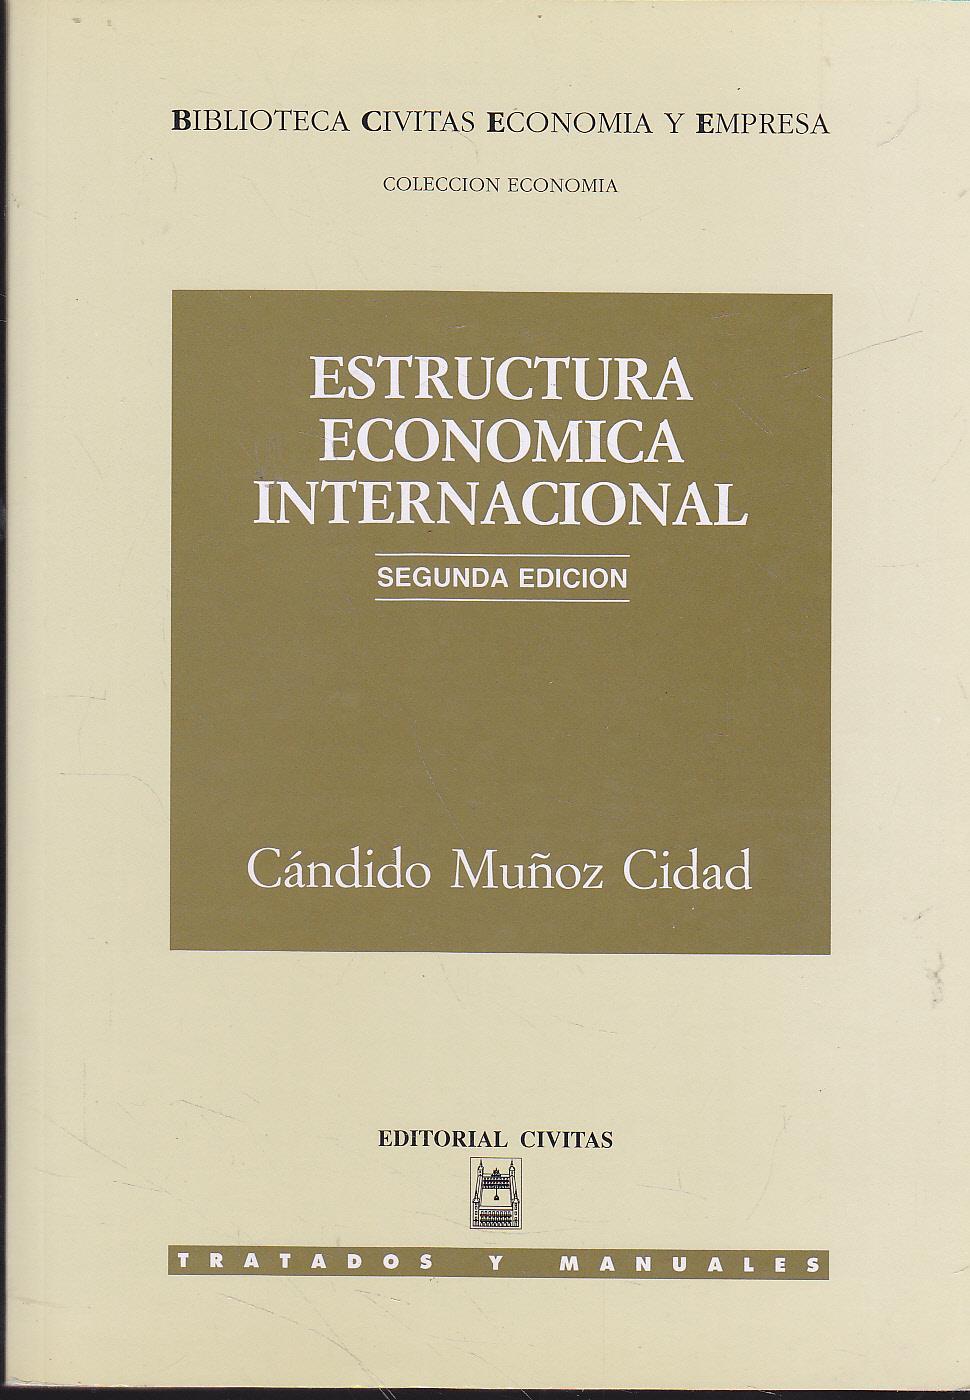 Estructura Economica Internacional 2ªedicion